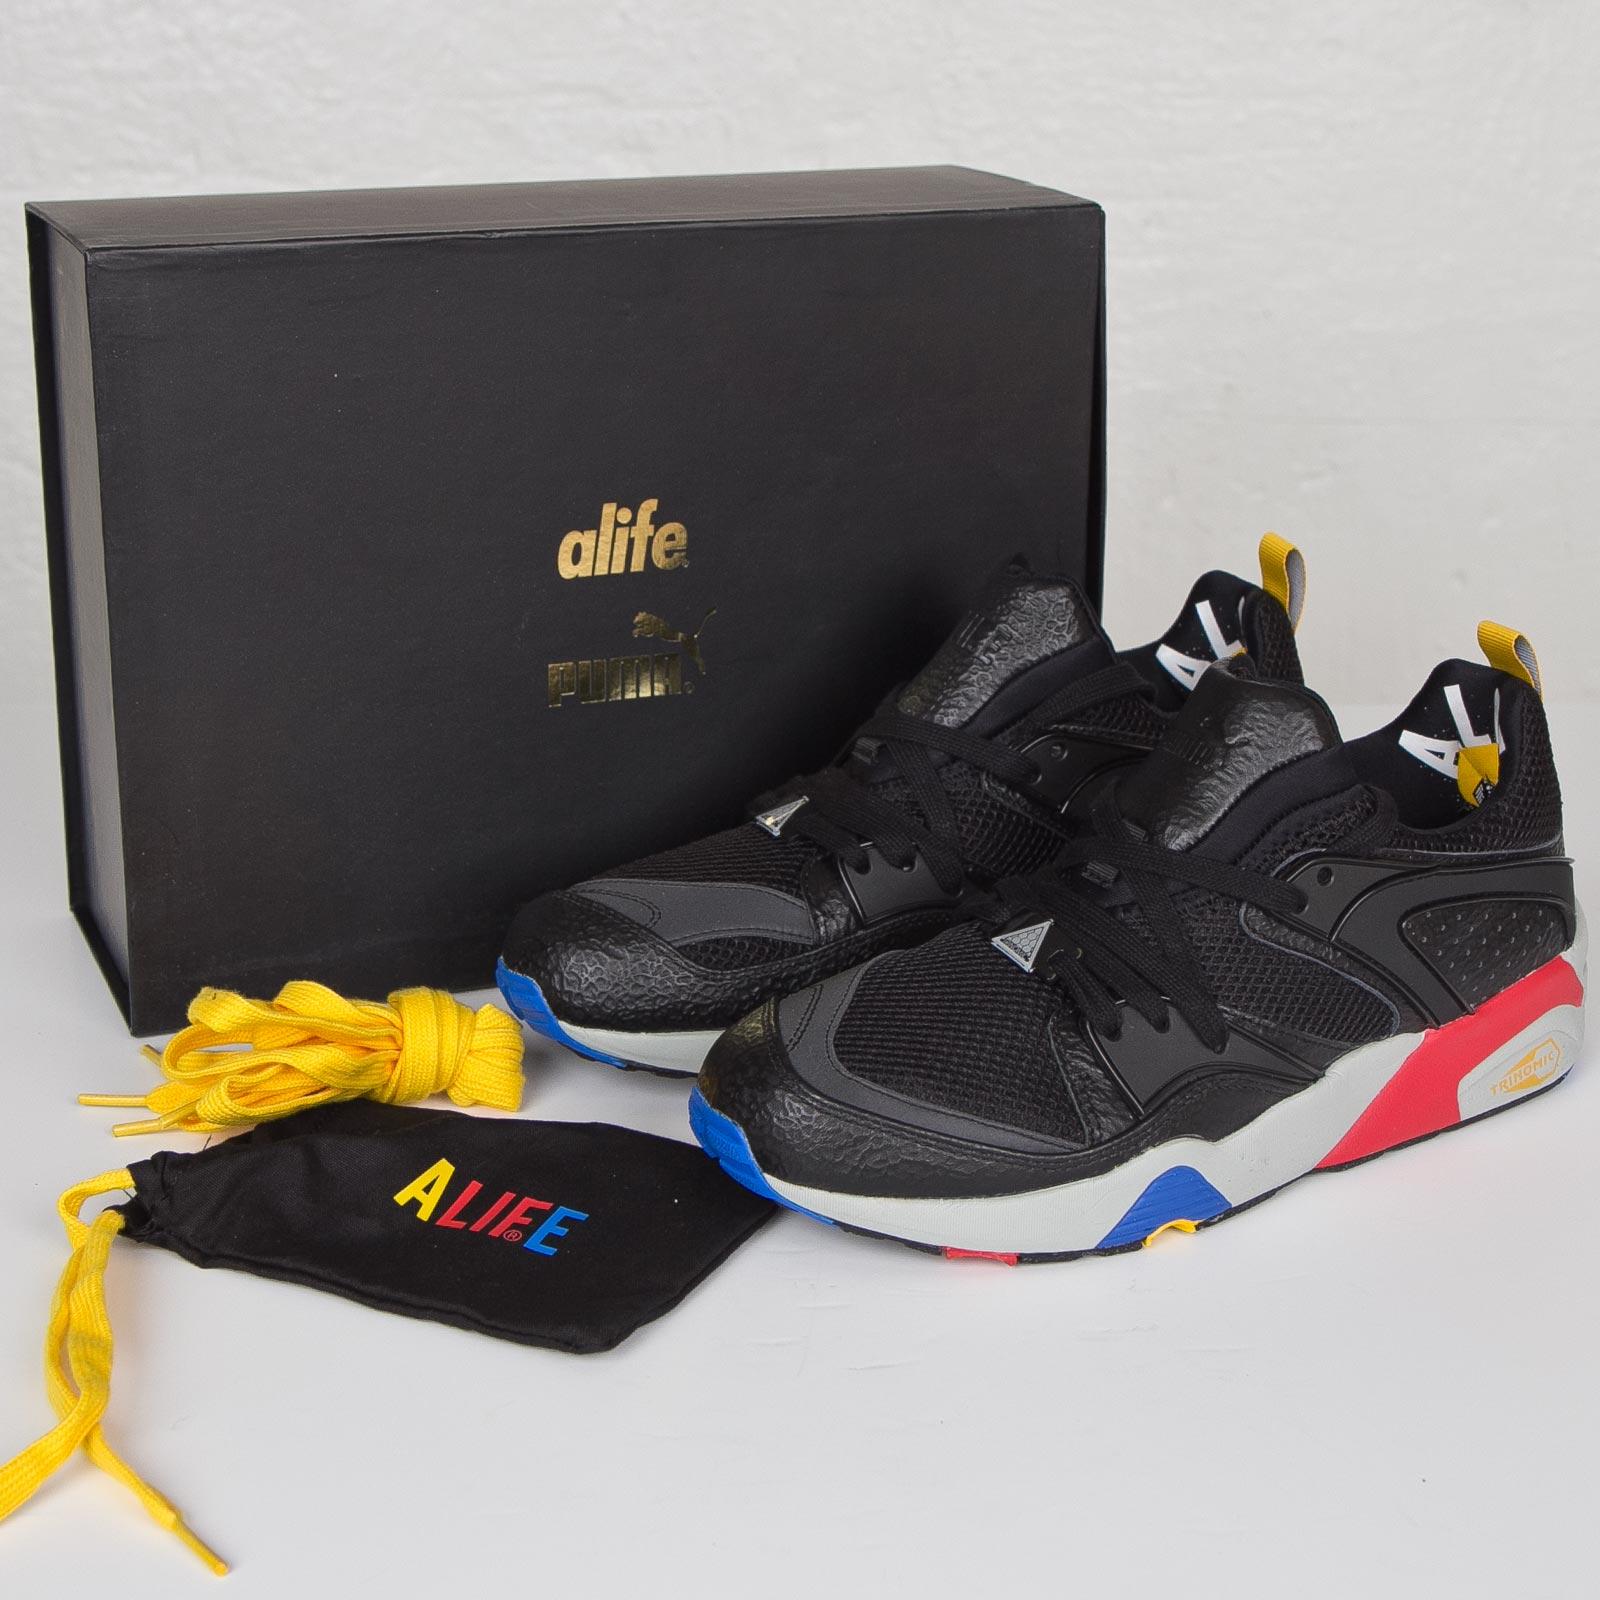 e0b6851983a6 Puma Puma Blaze Of Glory OG x Alife - 357735-01 - Sneakersnstuff ...